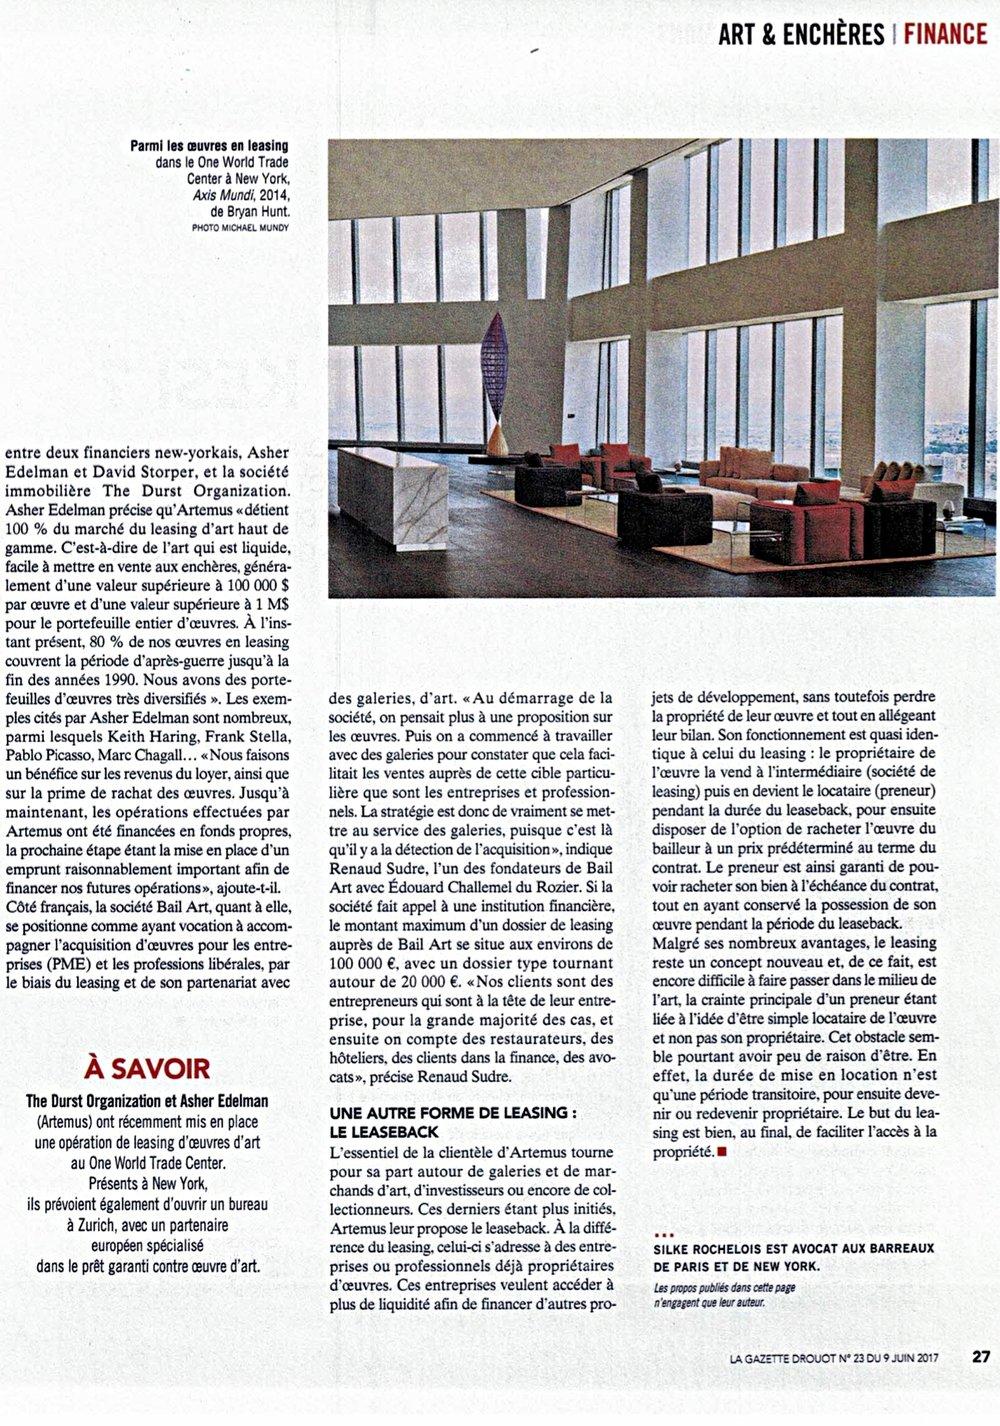 Gazette drouot p.2  juin 2017.jpg